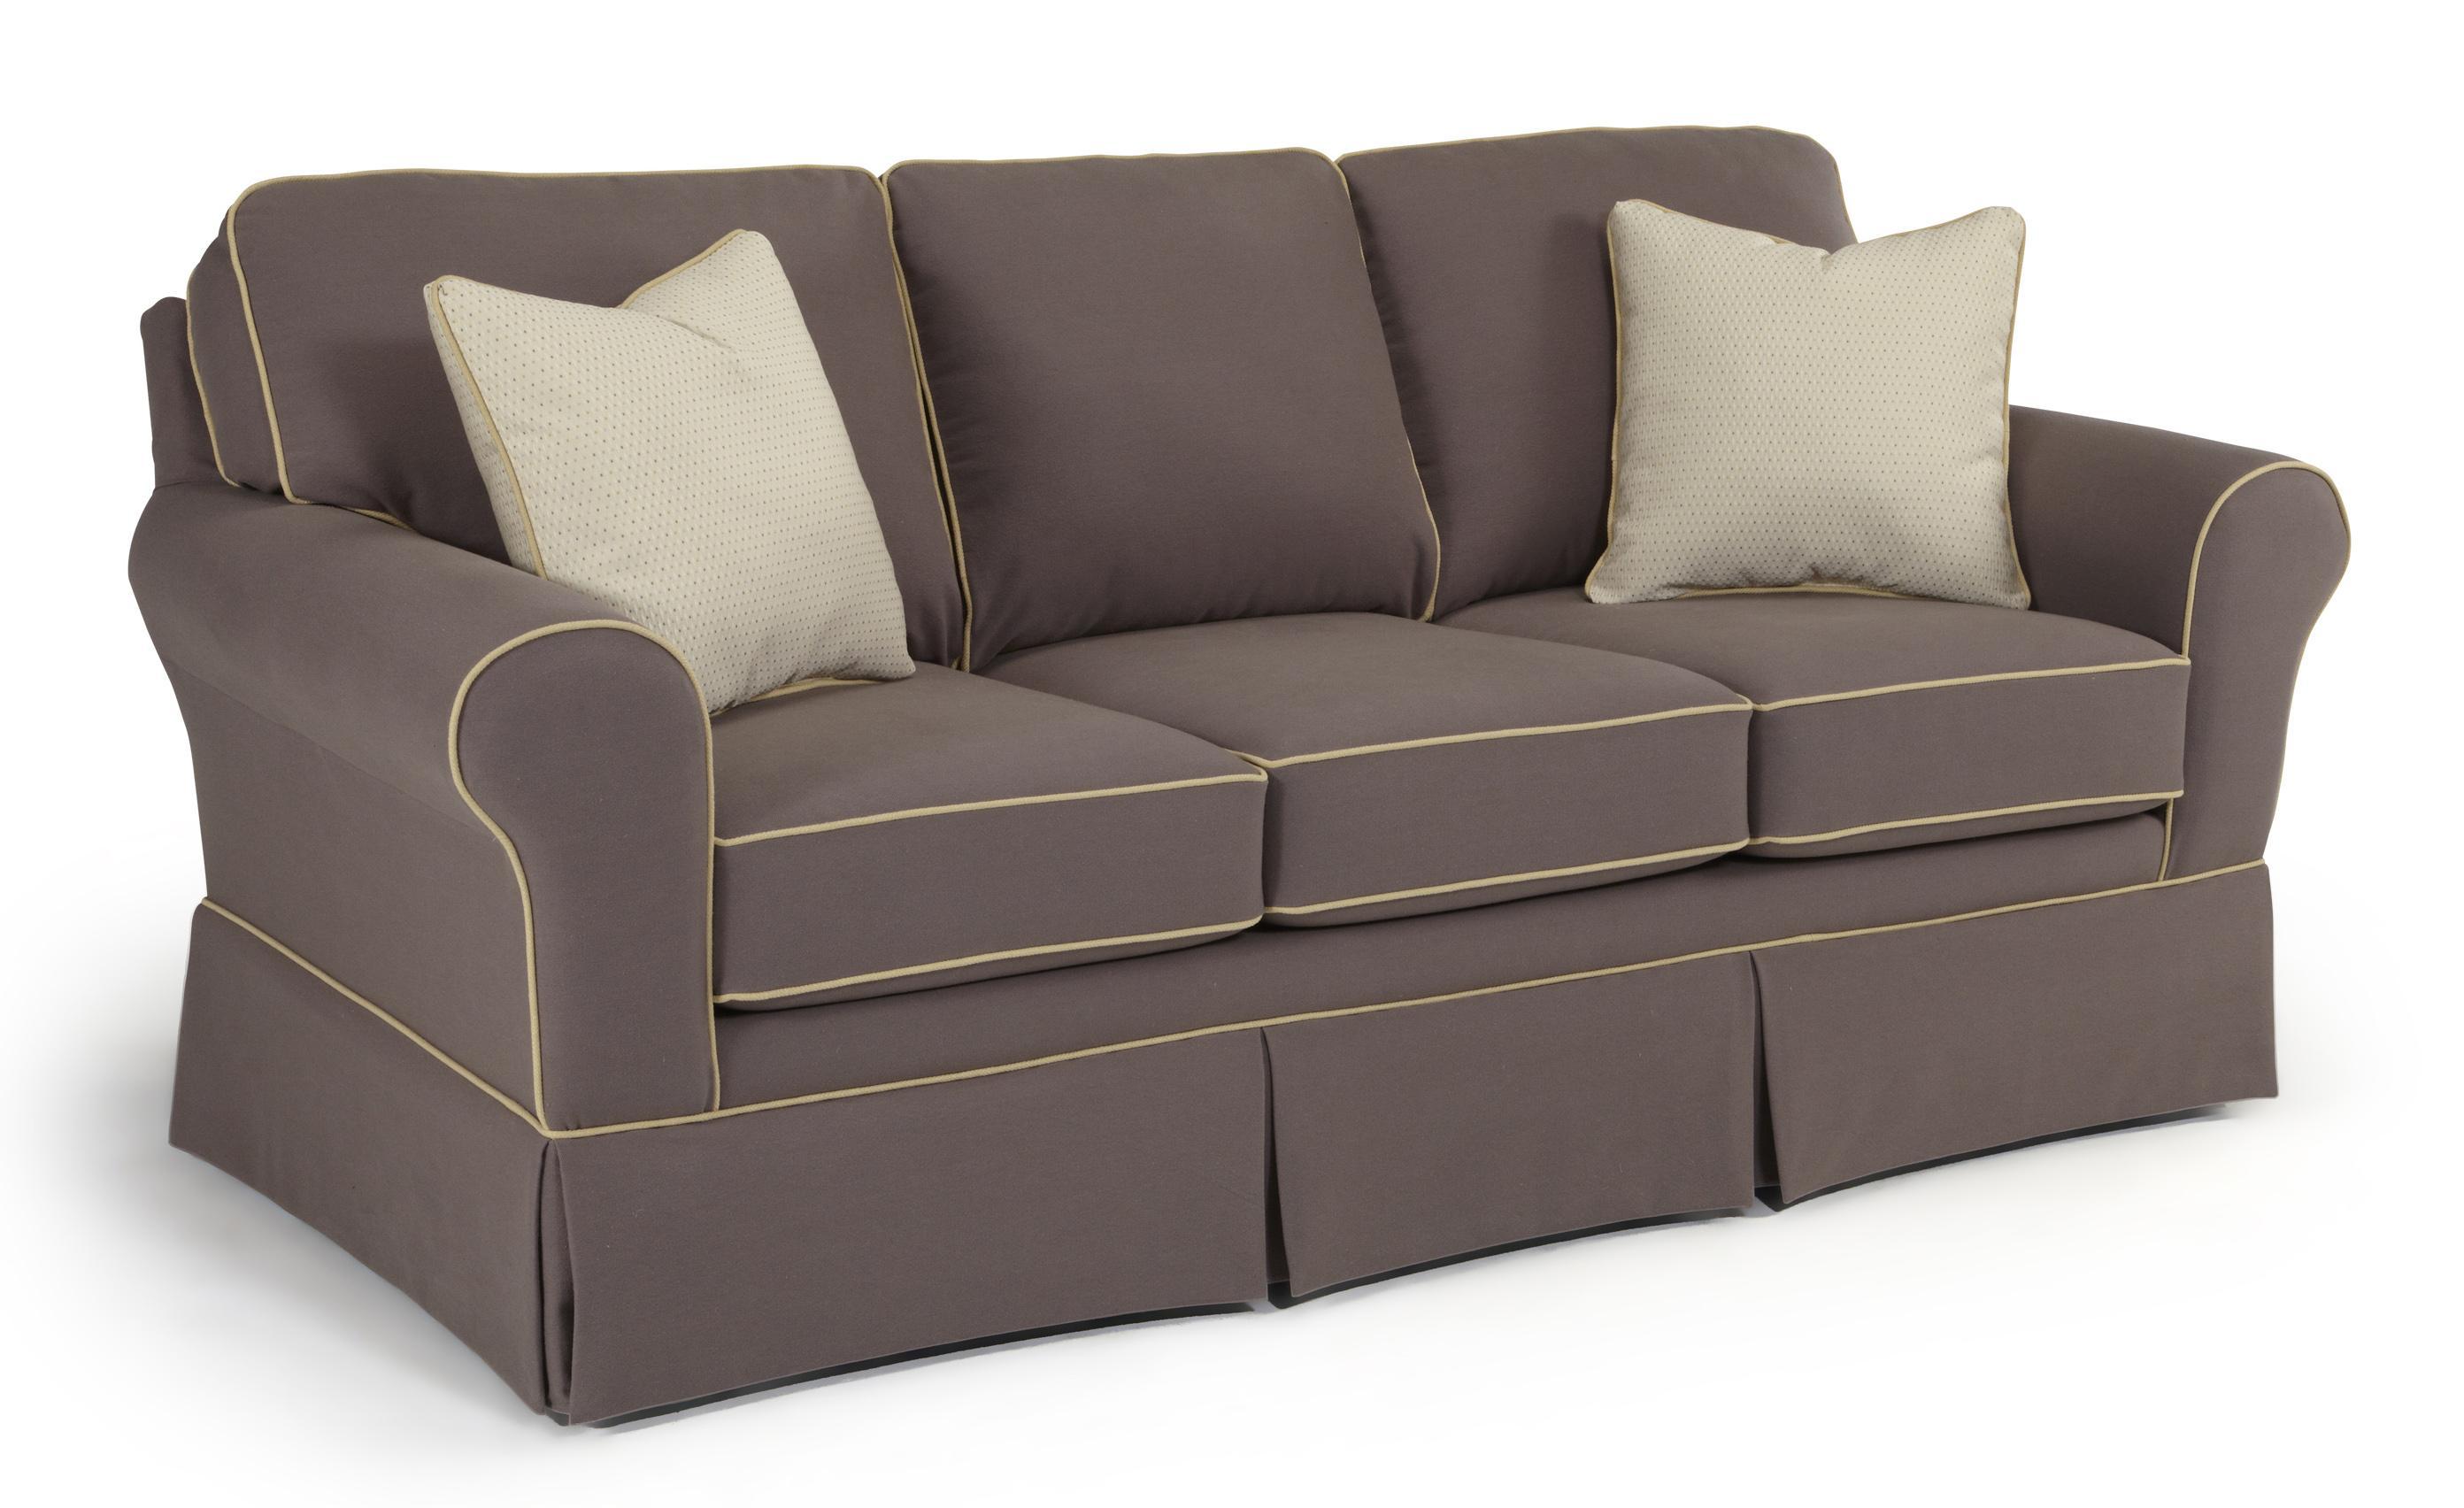 Annabel  <b>Custom</b> 3 Over 3 Sofa by Best Home Furnishings at Lapeer Furniture & Mattress Center